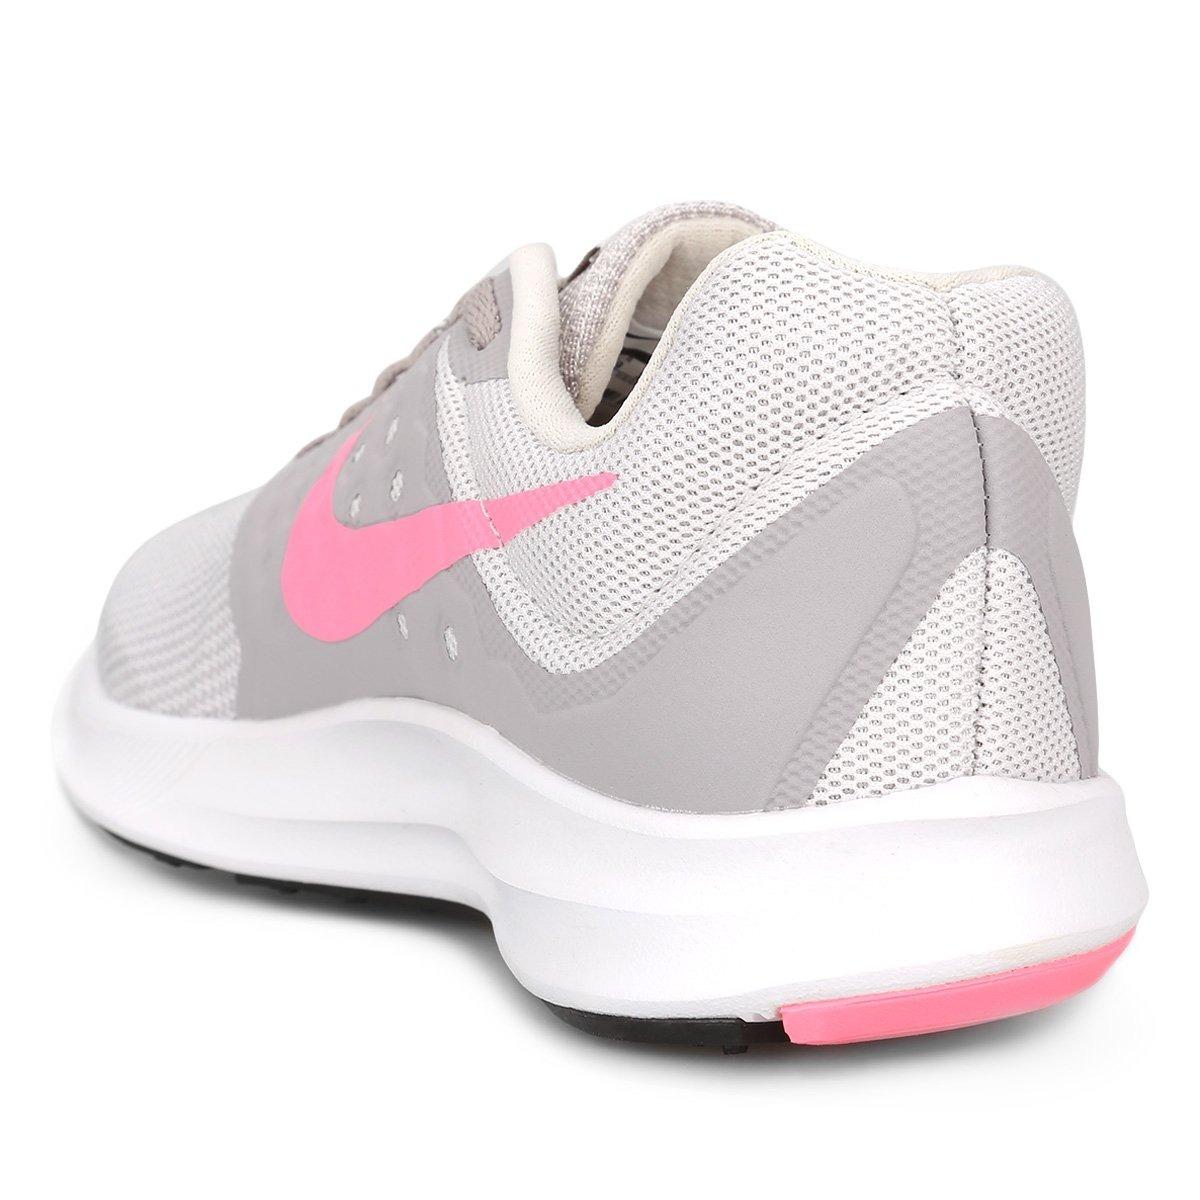 46b5949b298fc zapatillas nike downshifter 7 - gris y rosa -mujer. Cargando zoom.